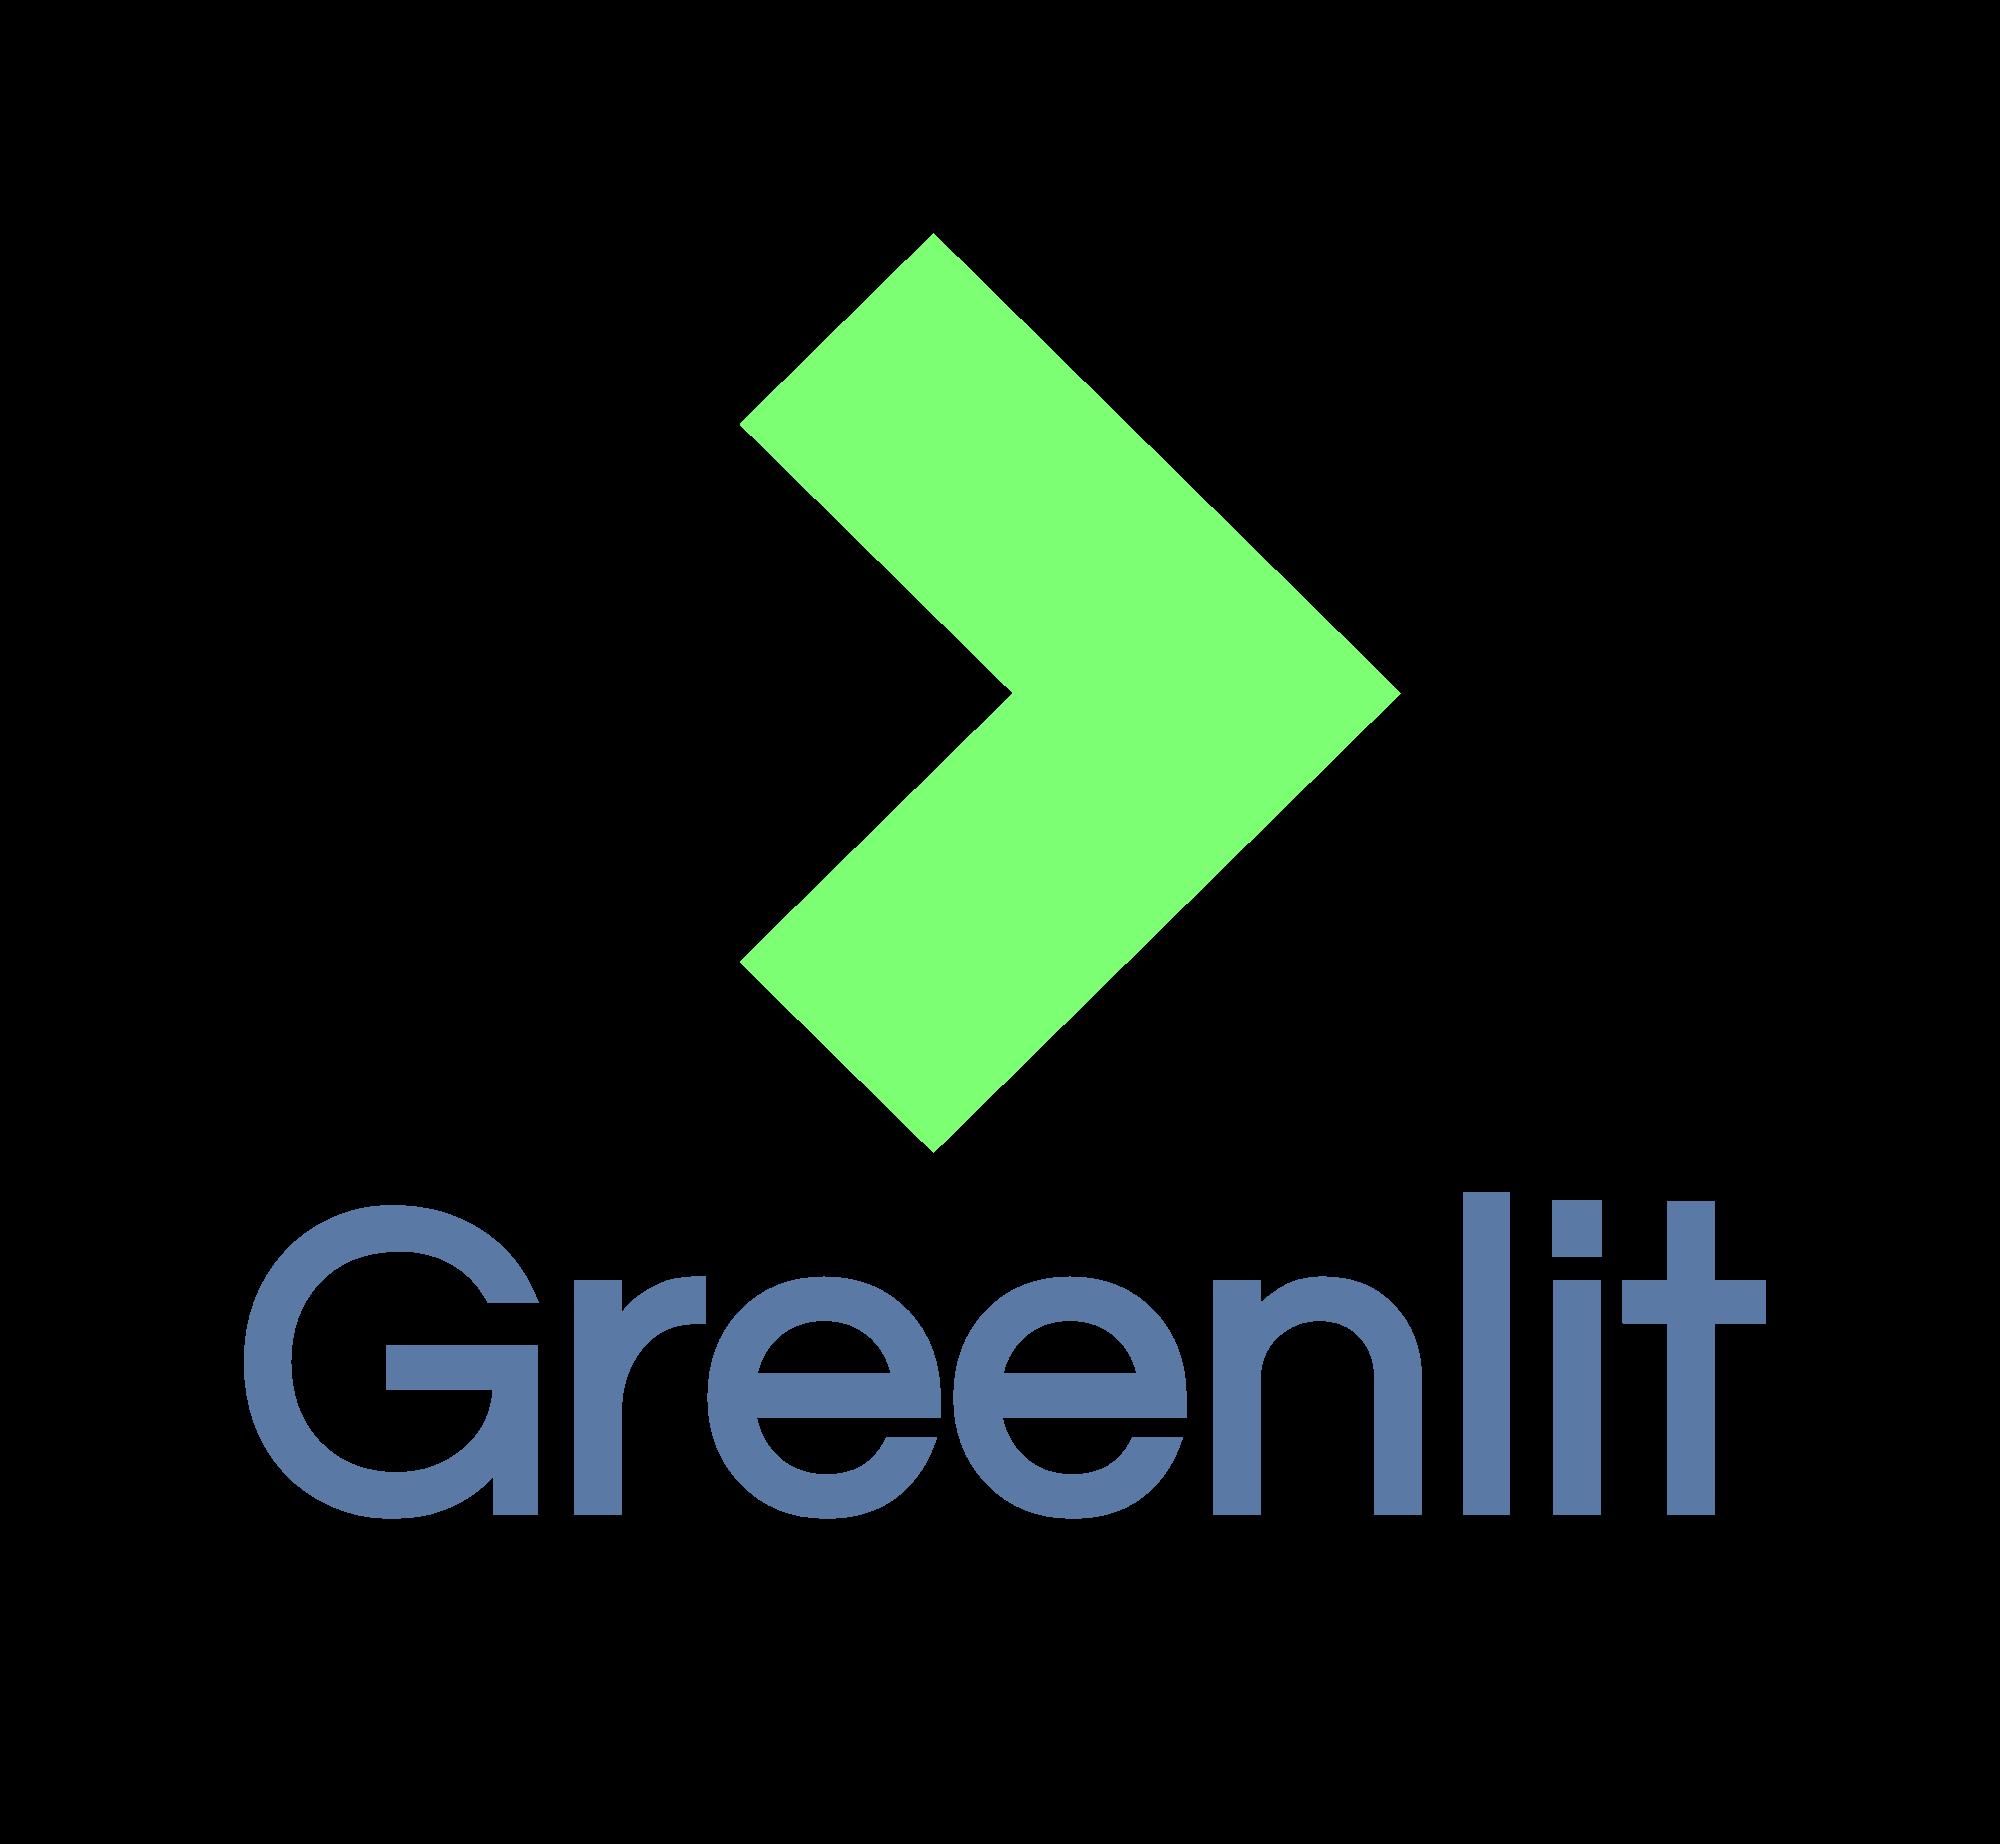 Copy of Copy of Greenlit